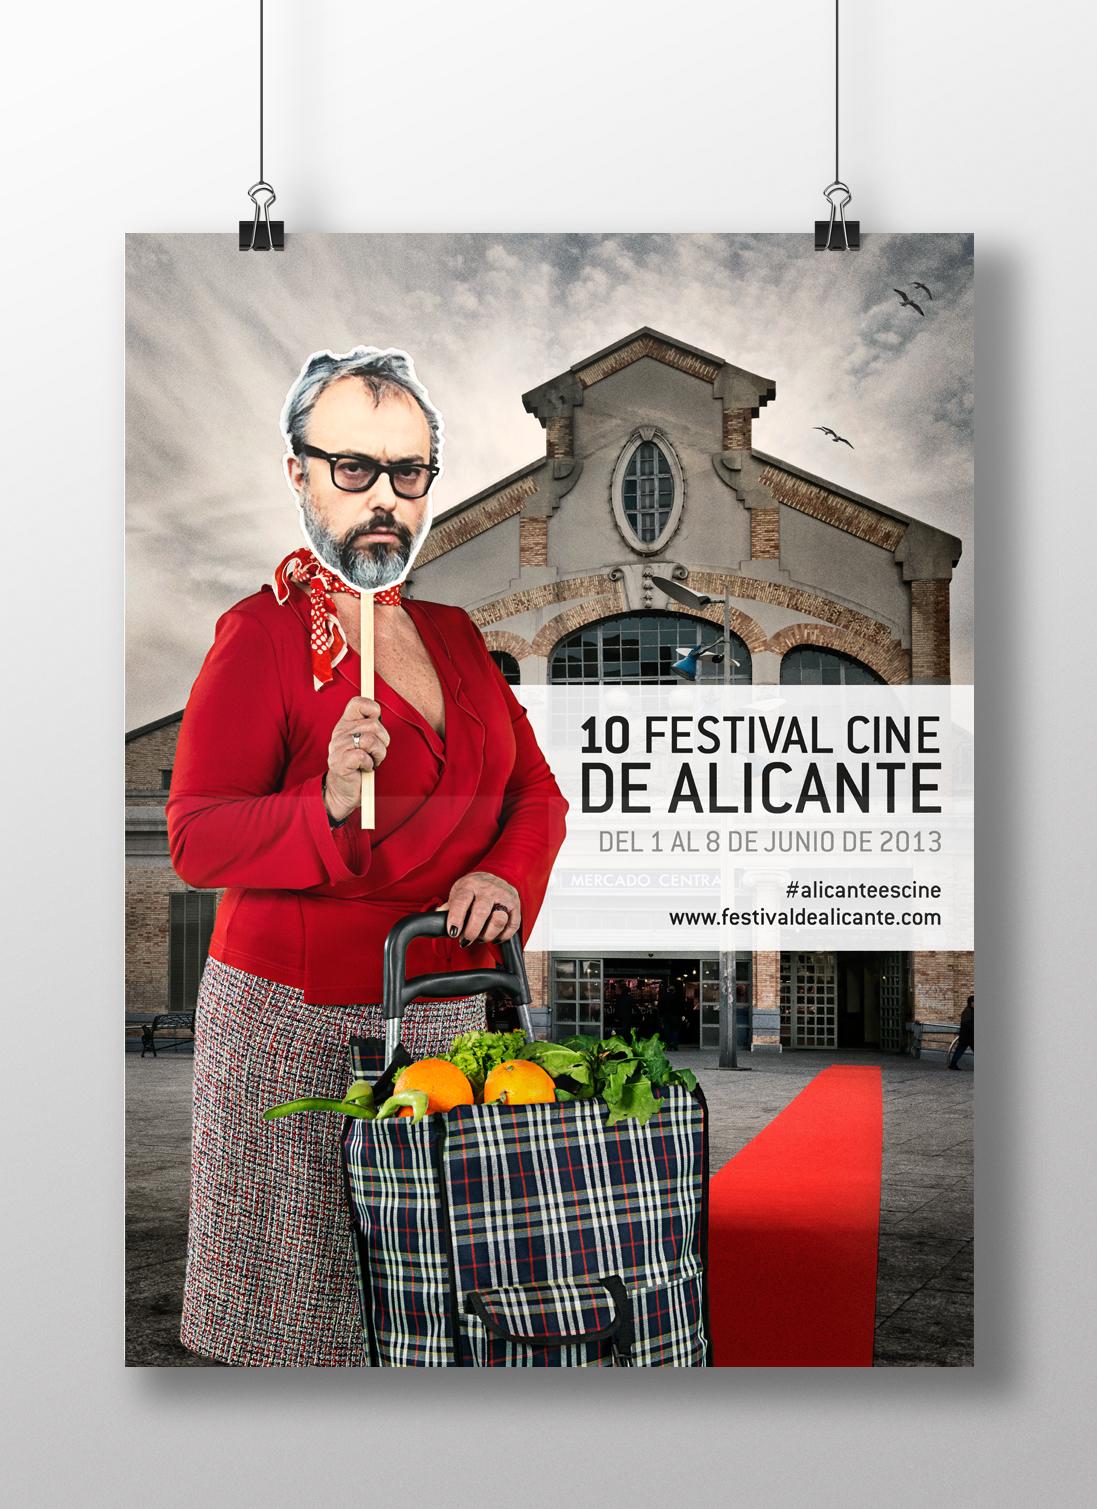 Imaginarte-FestivalCineAlicante2013.jpg